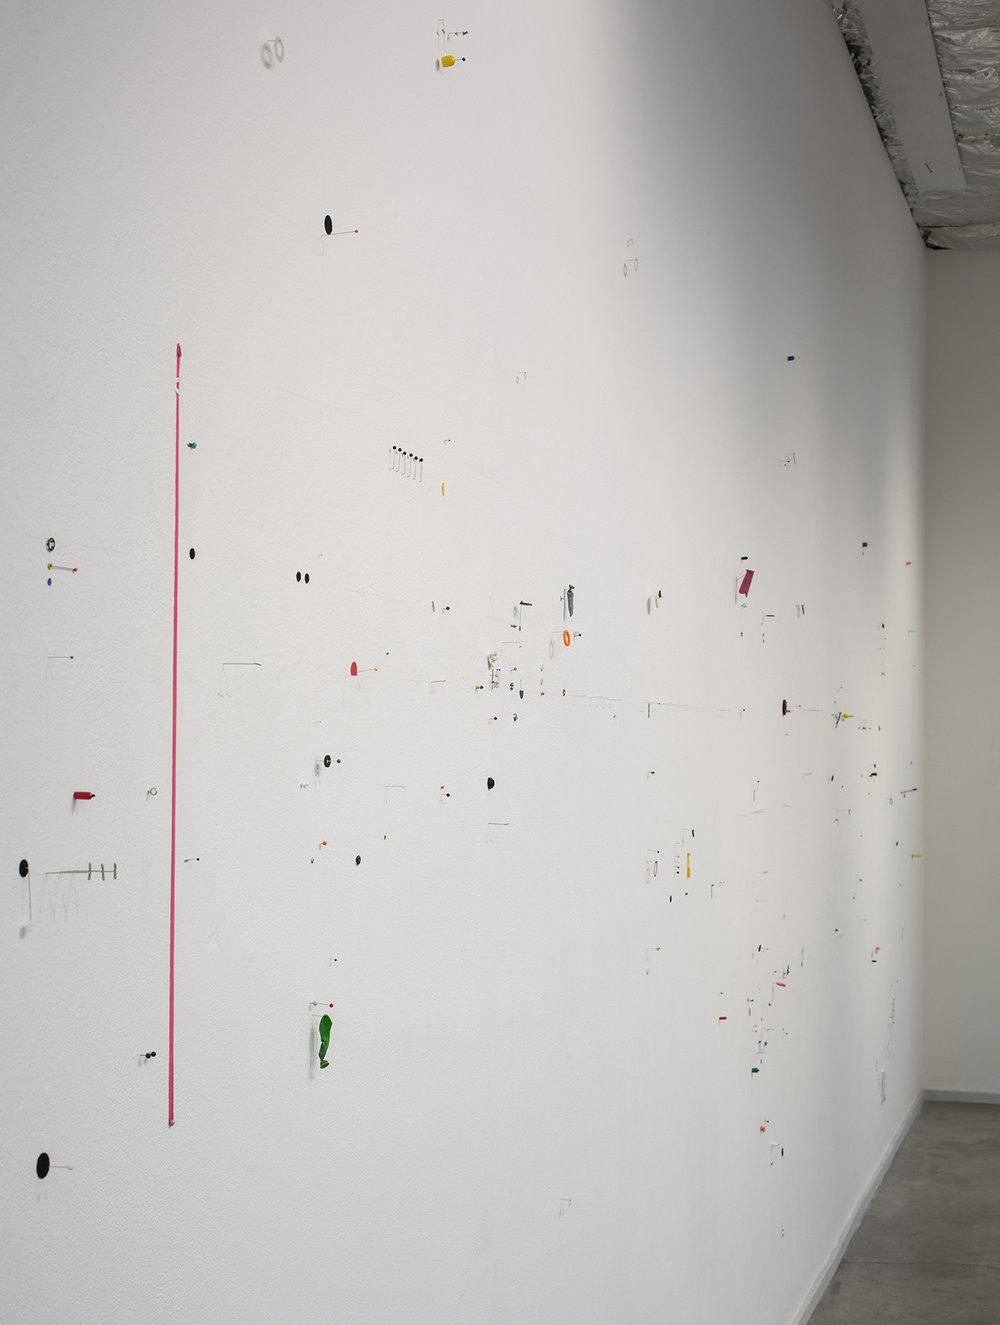 Mooring,  2013, mixed media wall installation, 10 x 31 feet